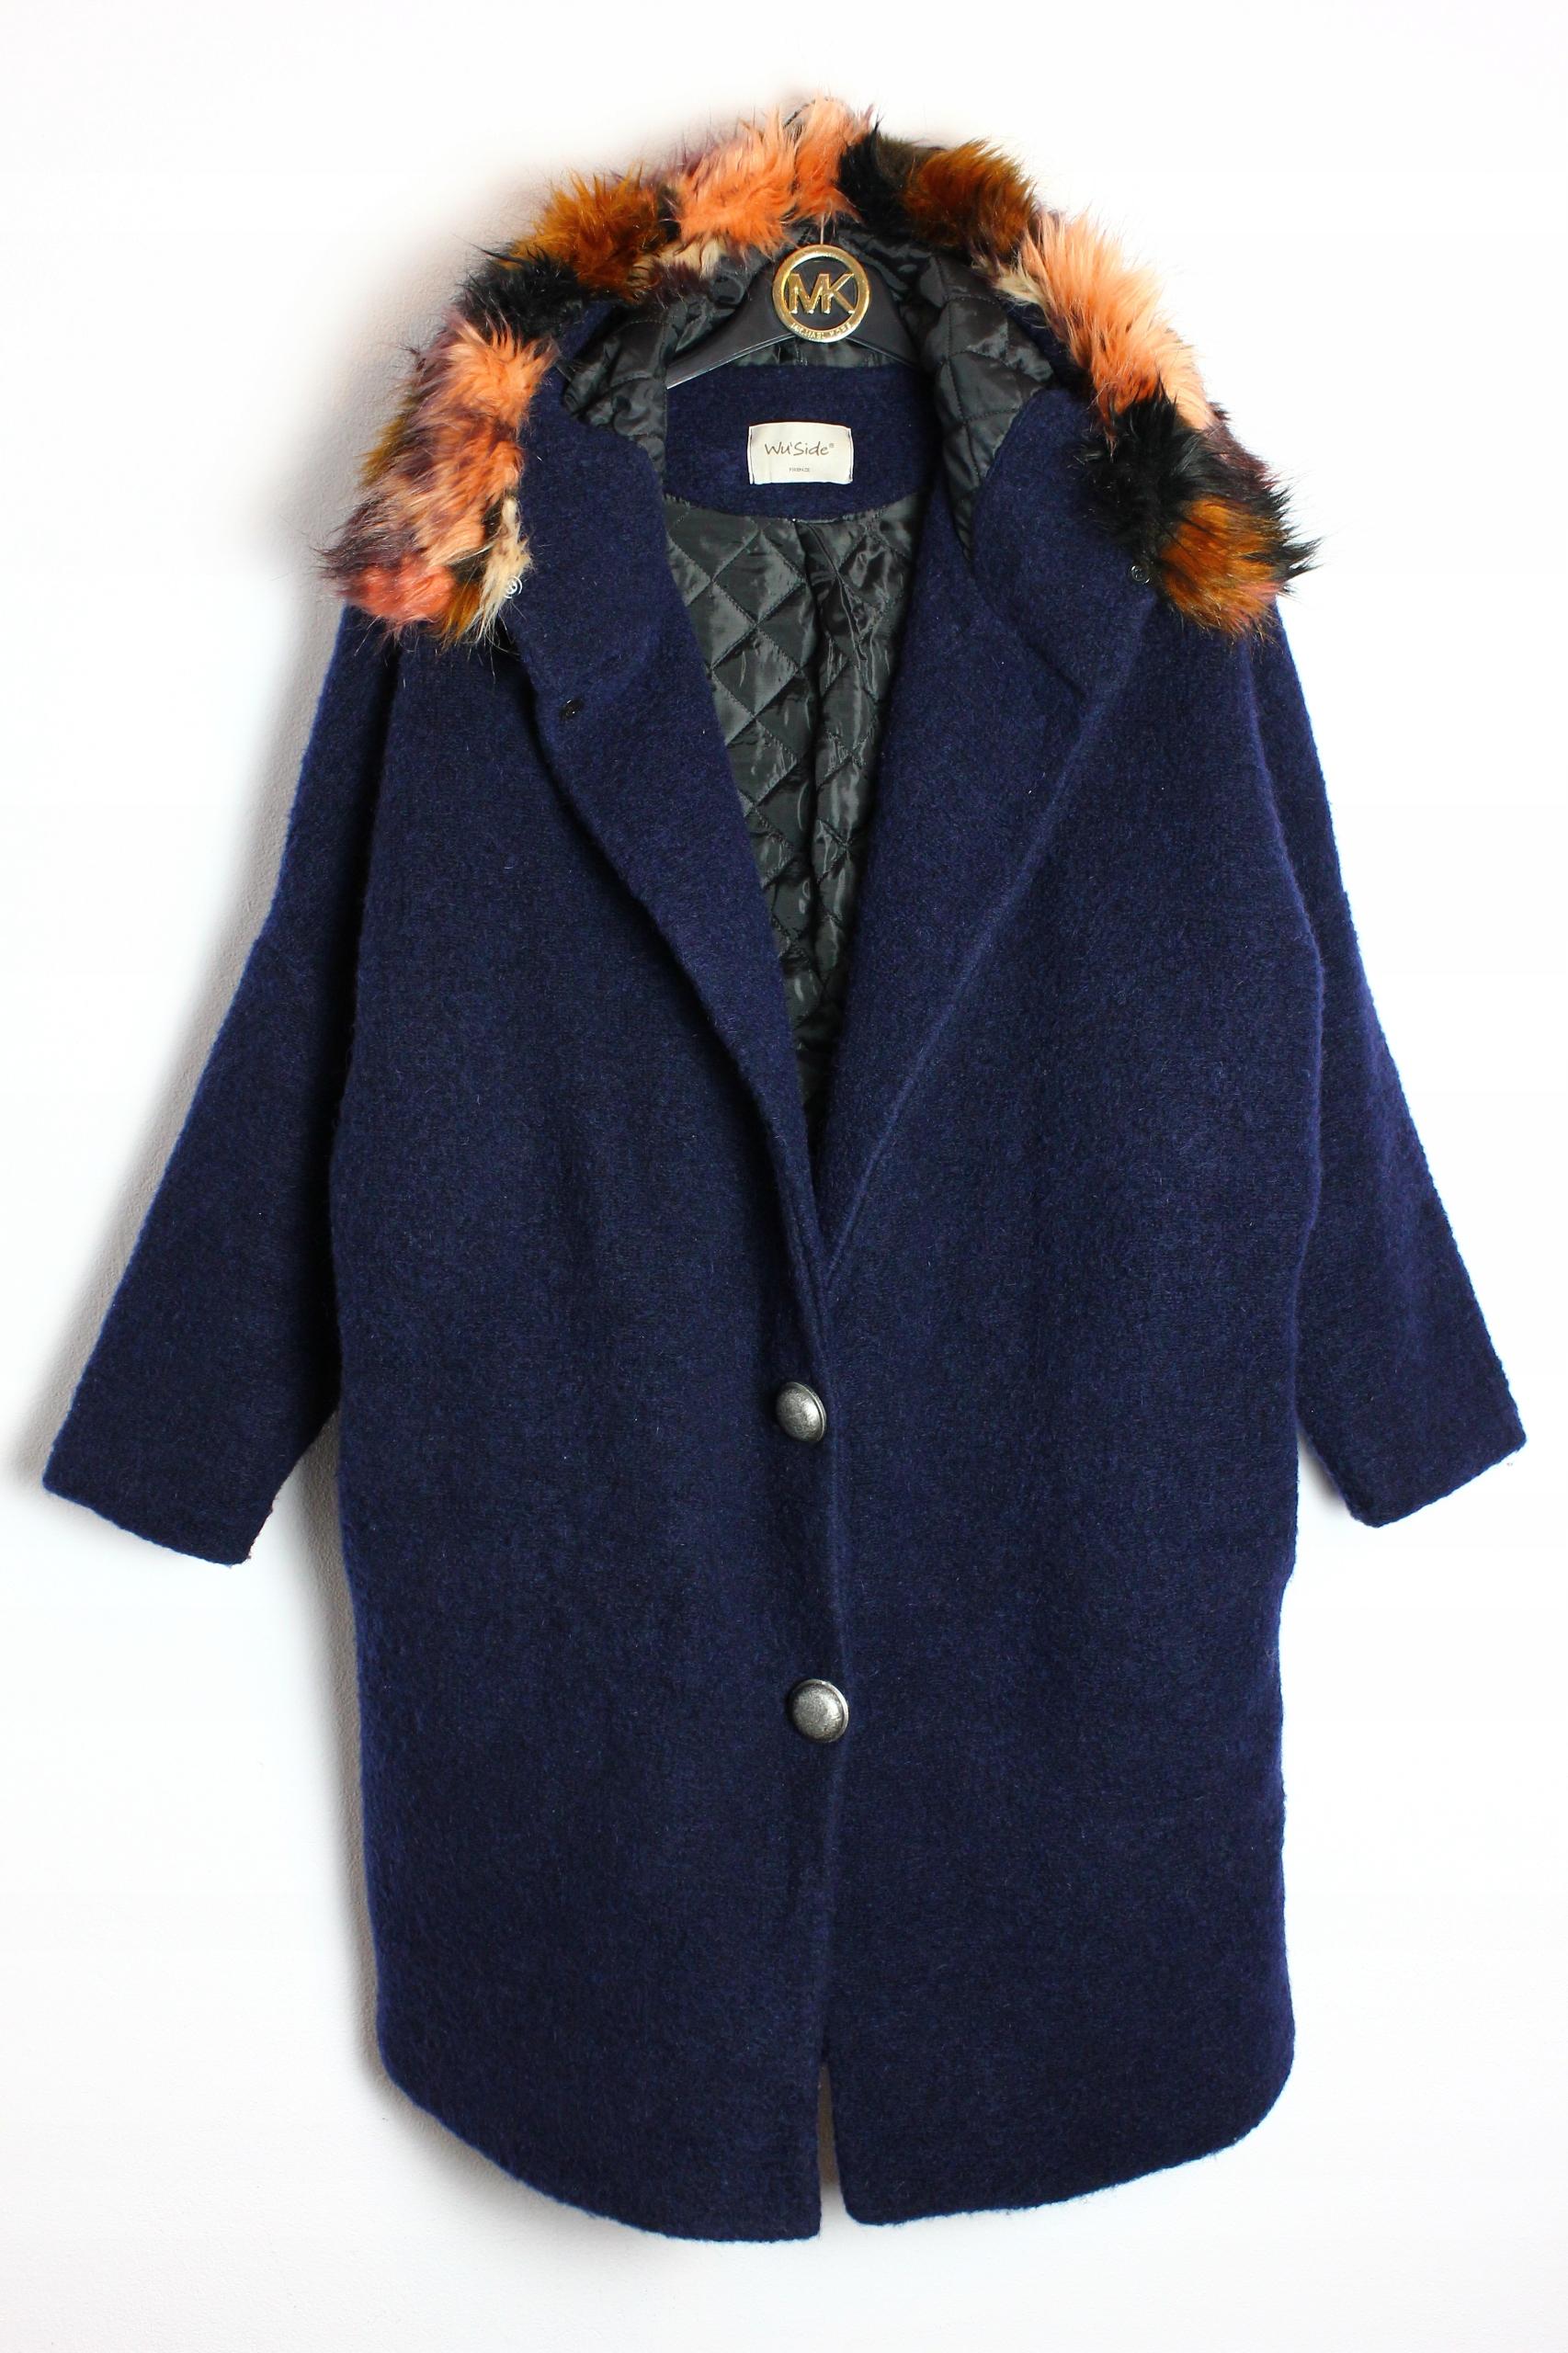 ea1710f87 Ocieplany płaszcz moher oversize Wu Side Firenze L - 7839220988 ...